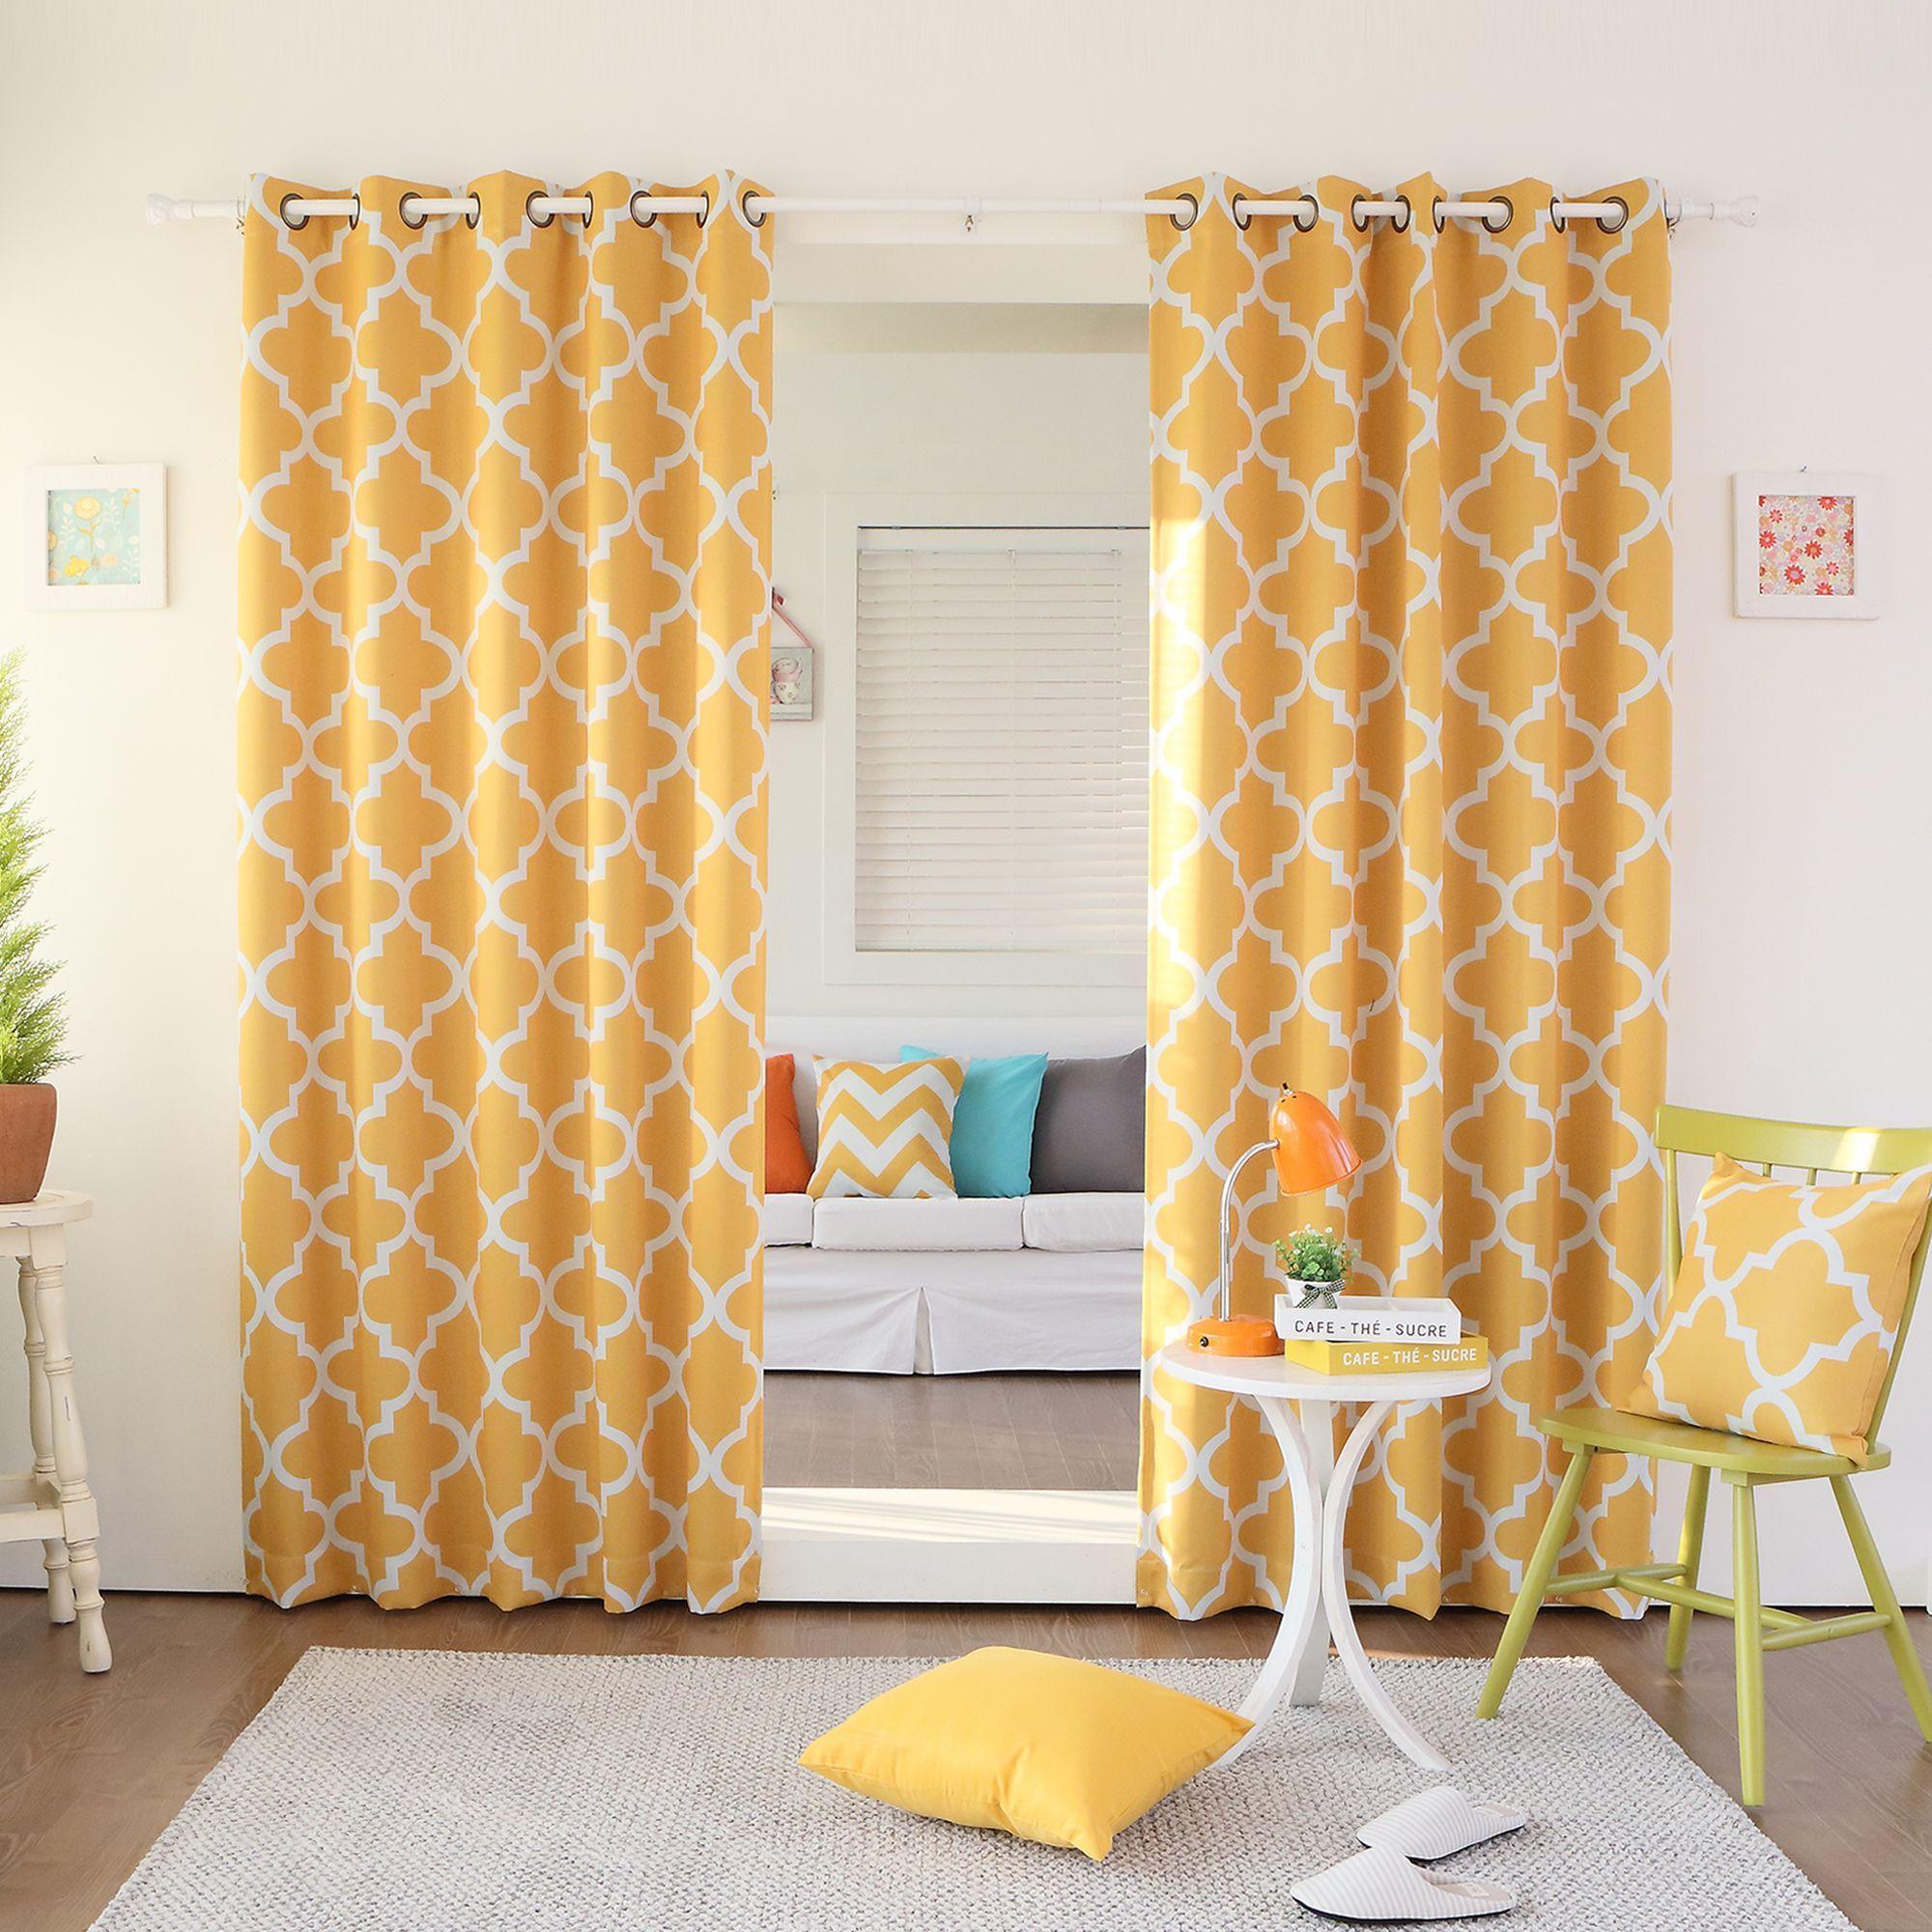 Aurora home moroccan tile inch window curtain panel pair beige